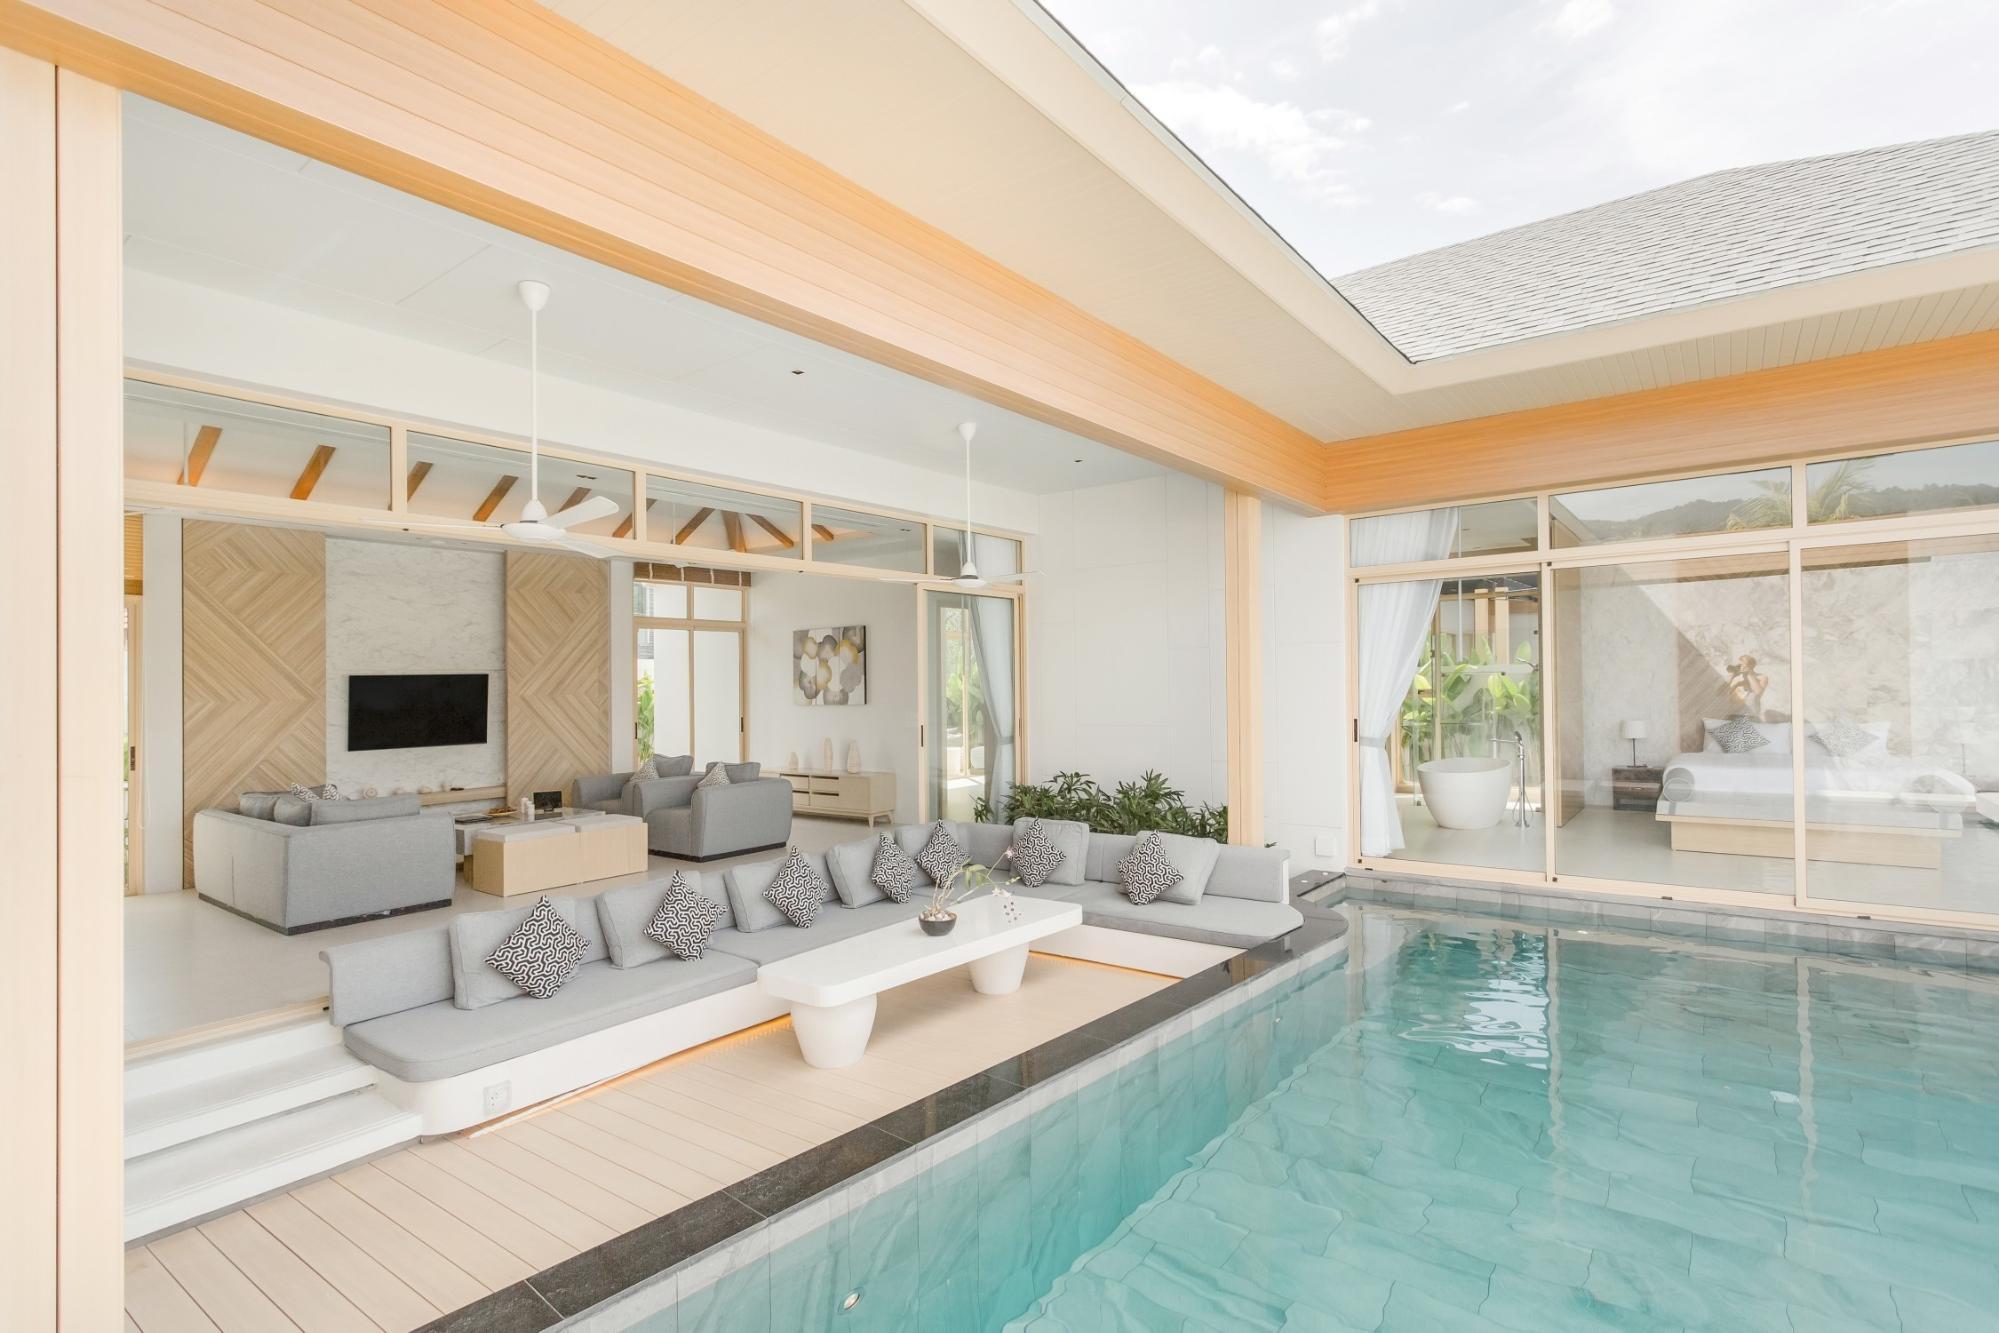 10 Airbnb Villas in Phuket for an Unforgettable Trip